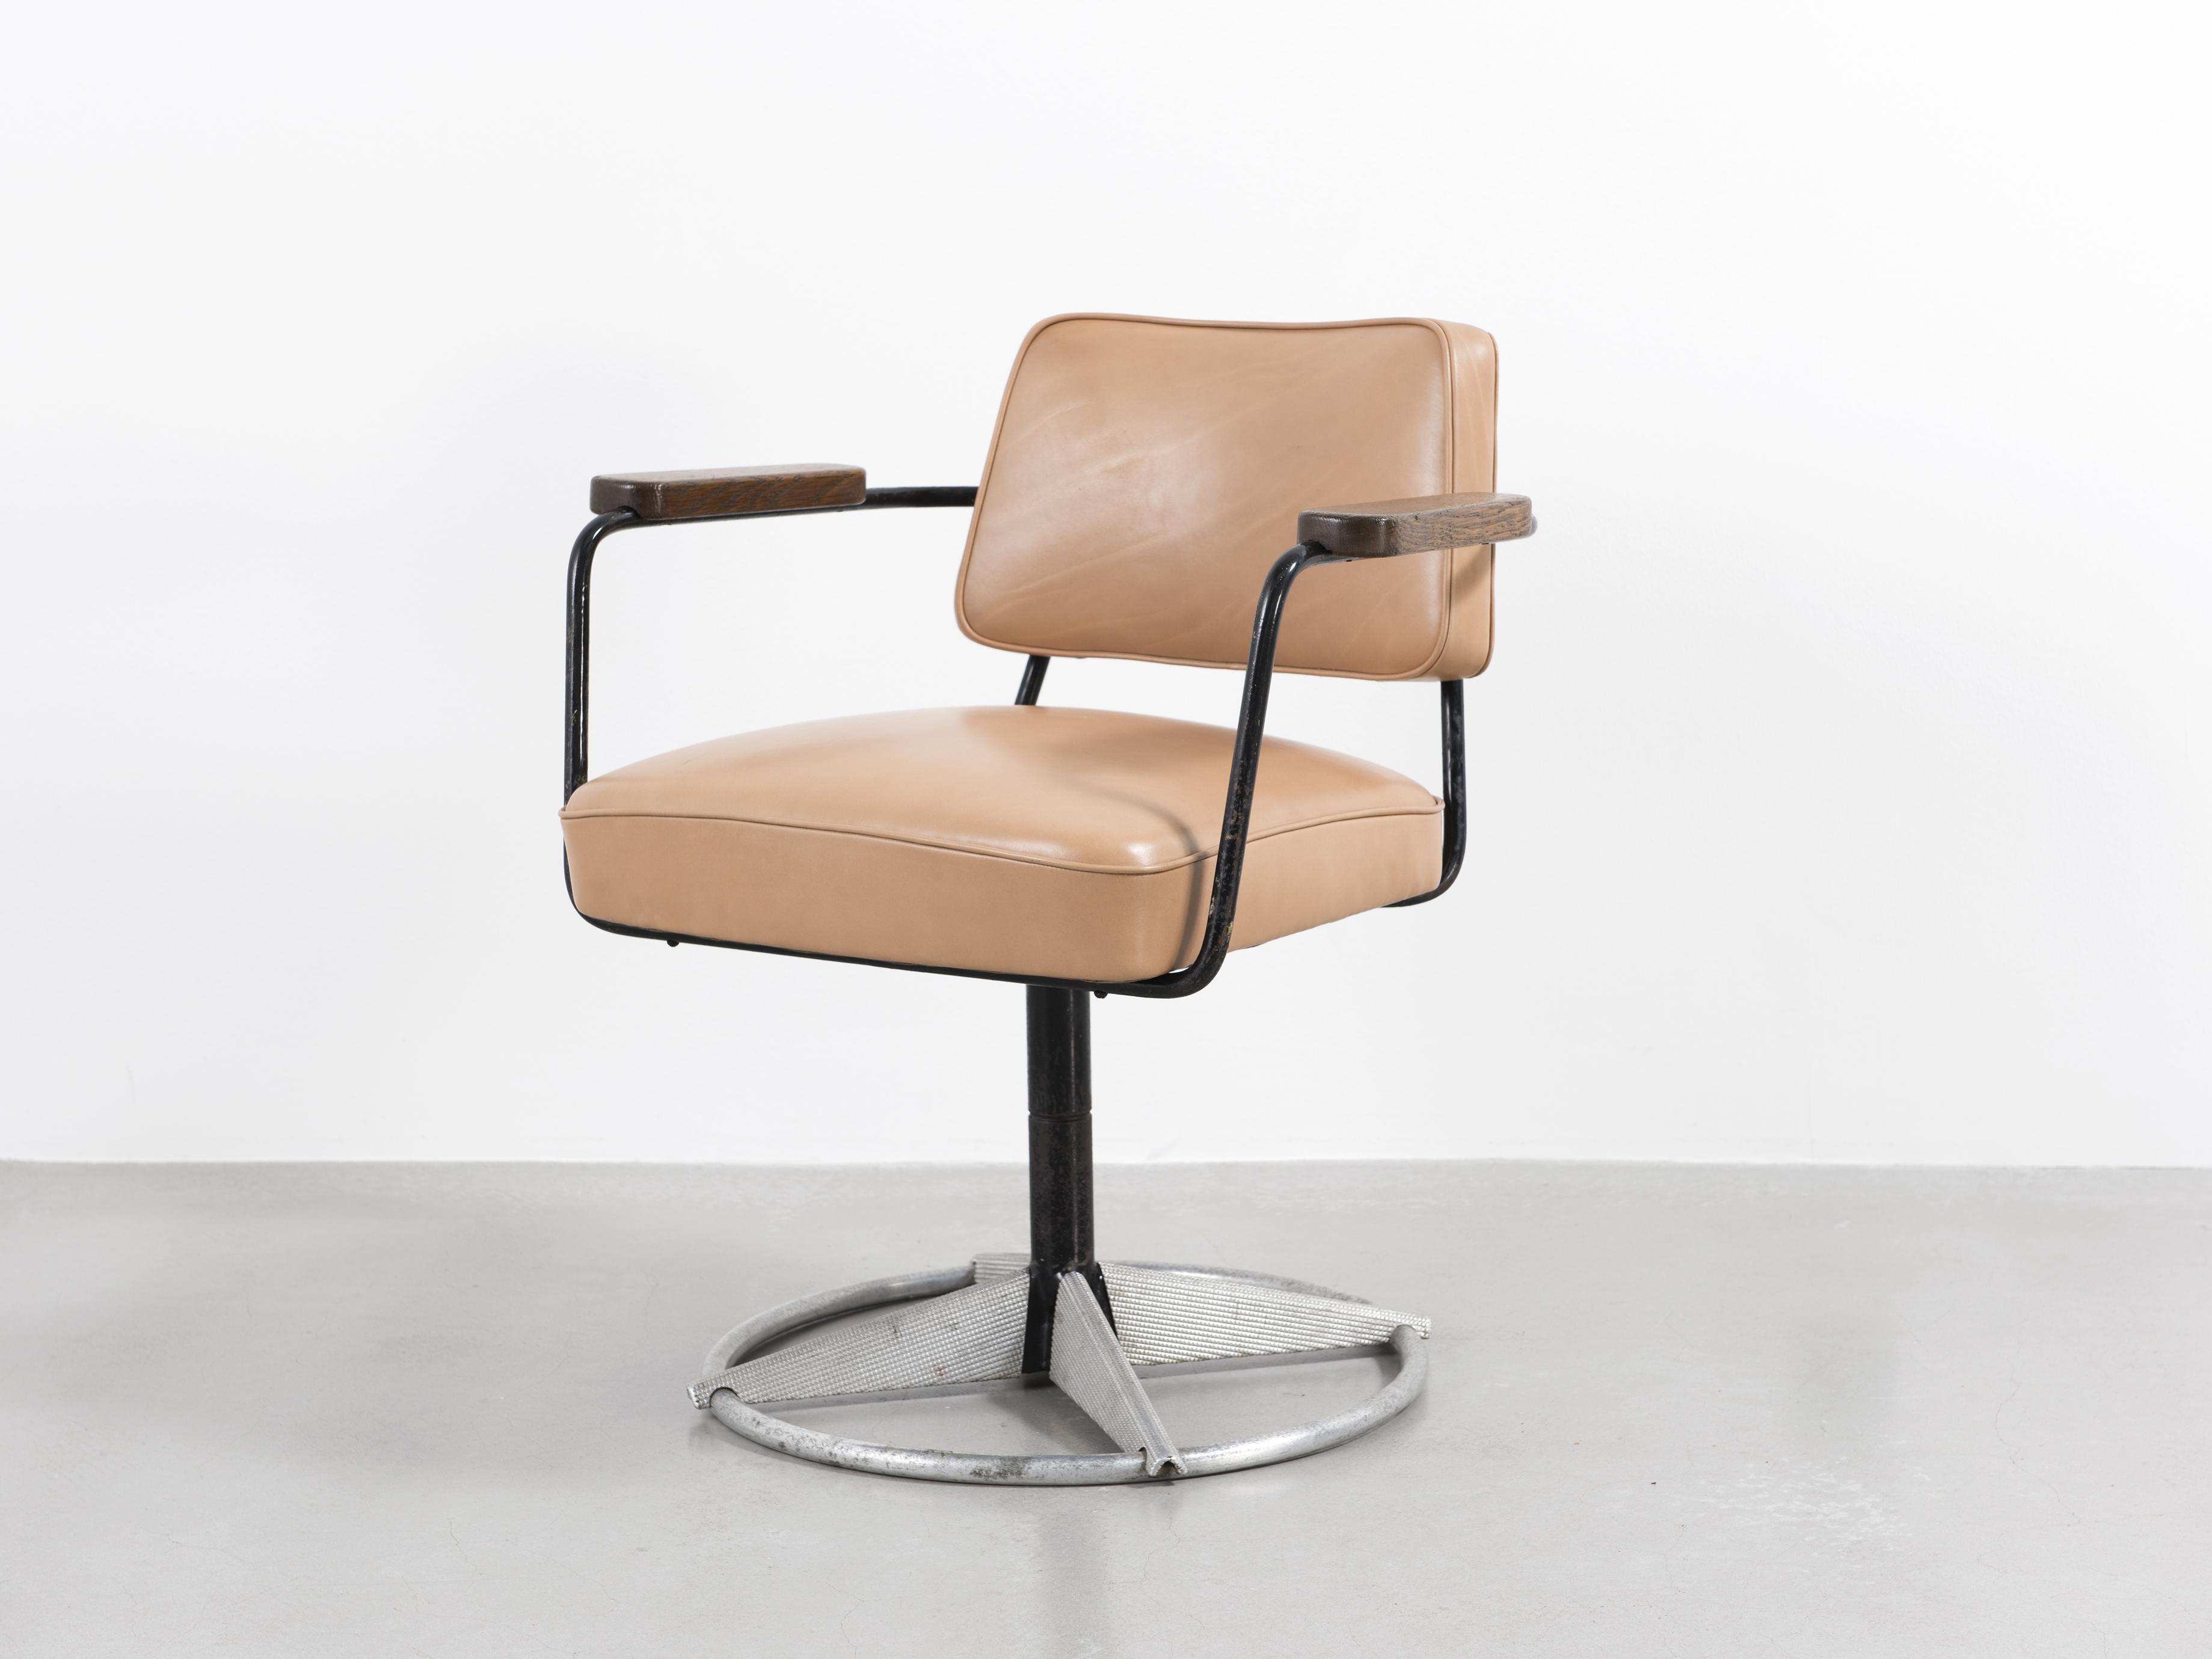 jean prouv fauteuil direction pivotant n 353 1951 galerie patrick seguin. Black Bedroom Furniture Sets. Home Design Ideas